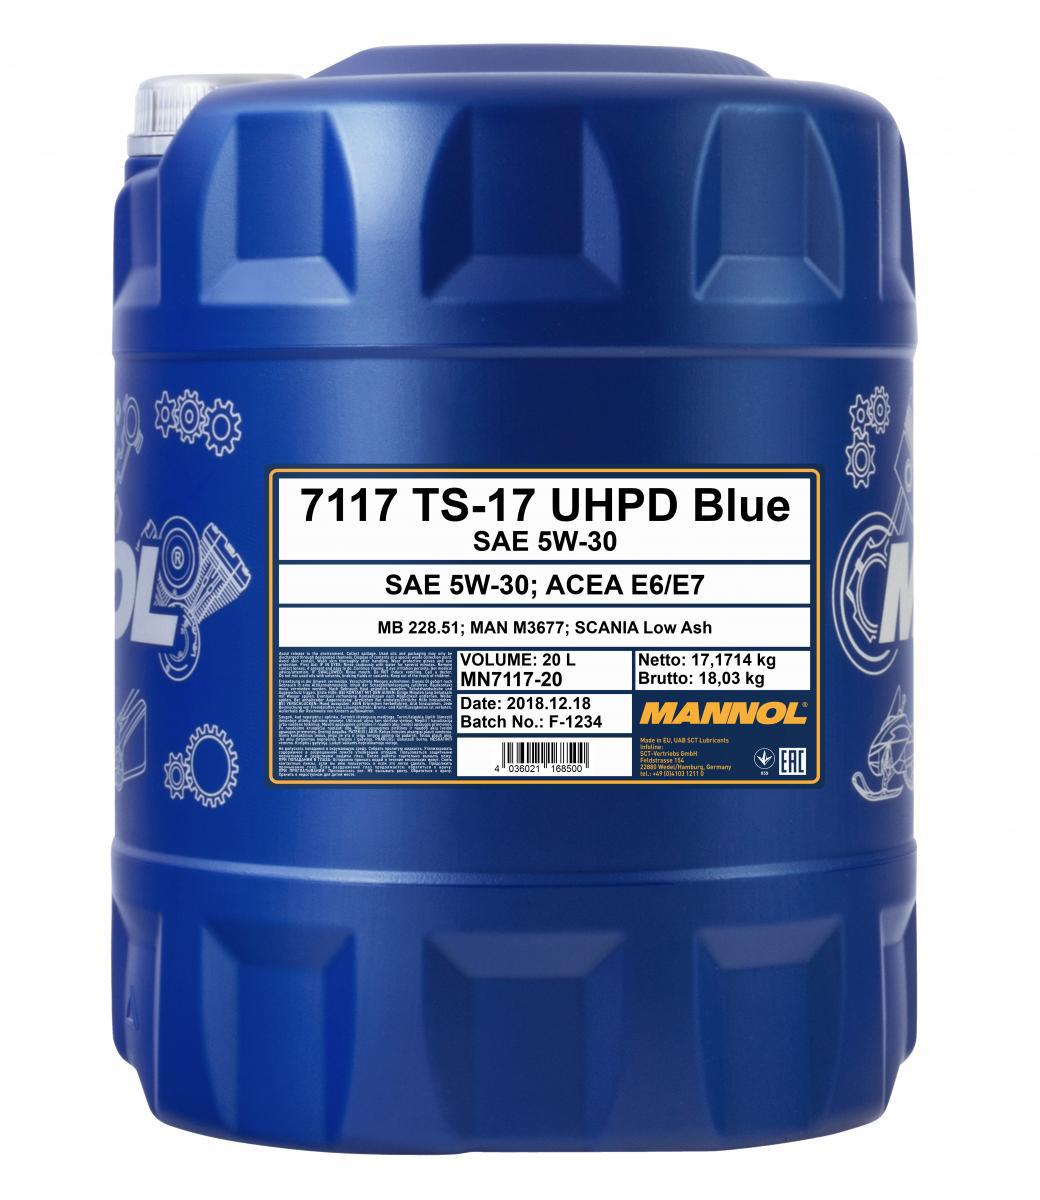 TS-17 UHPD Blue 5W-30